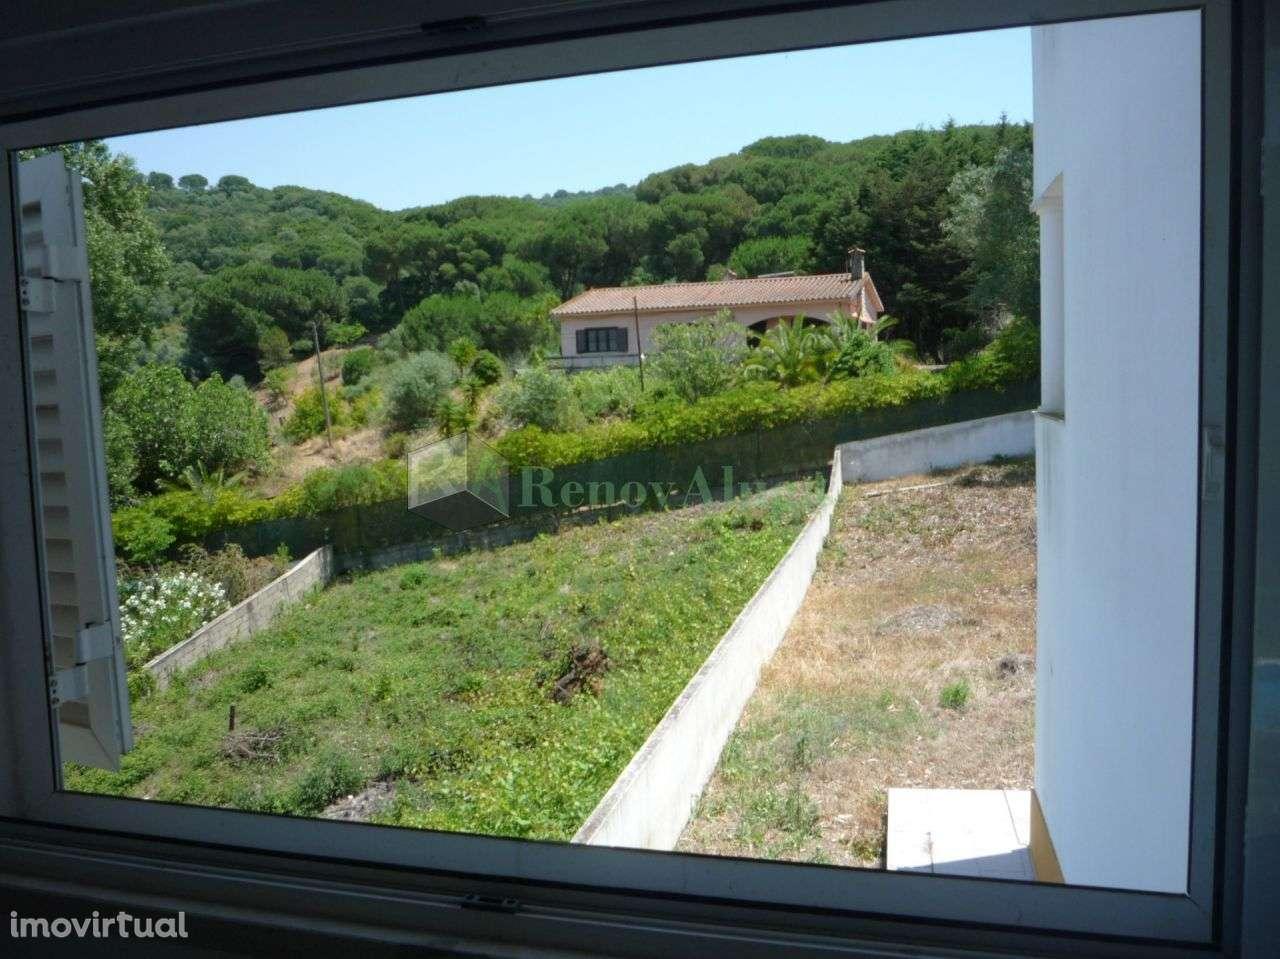 Moradia para arrendar, Quinta do Anjo, Setúbal - Foto 4